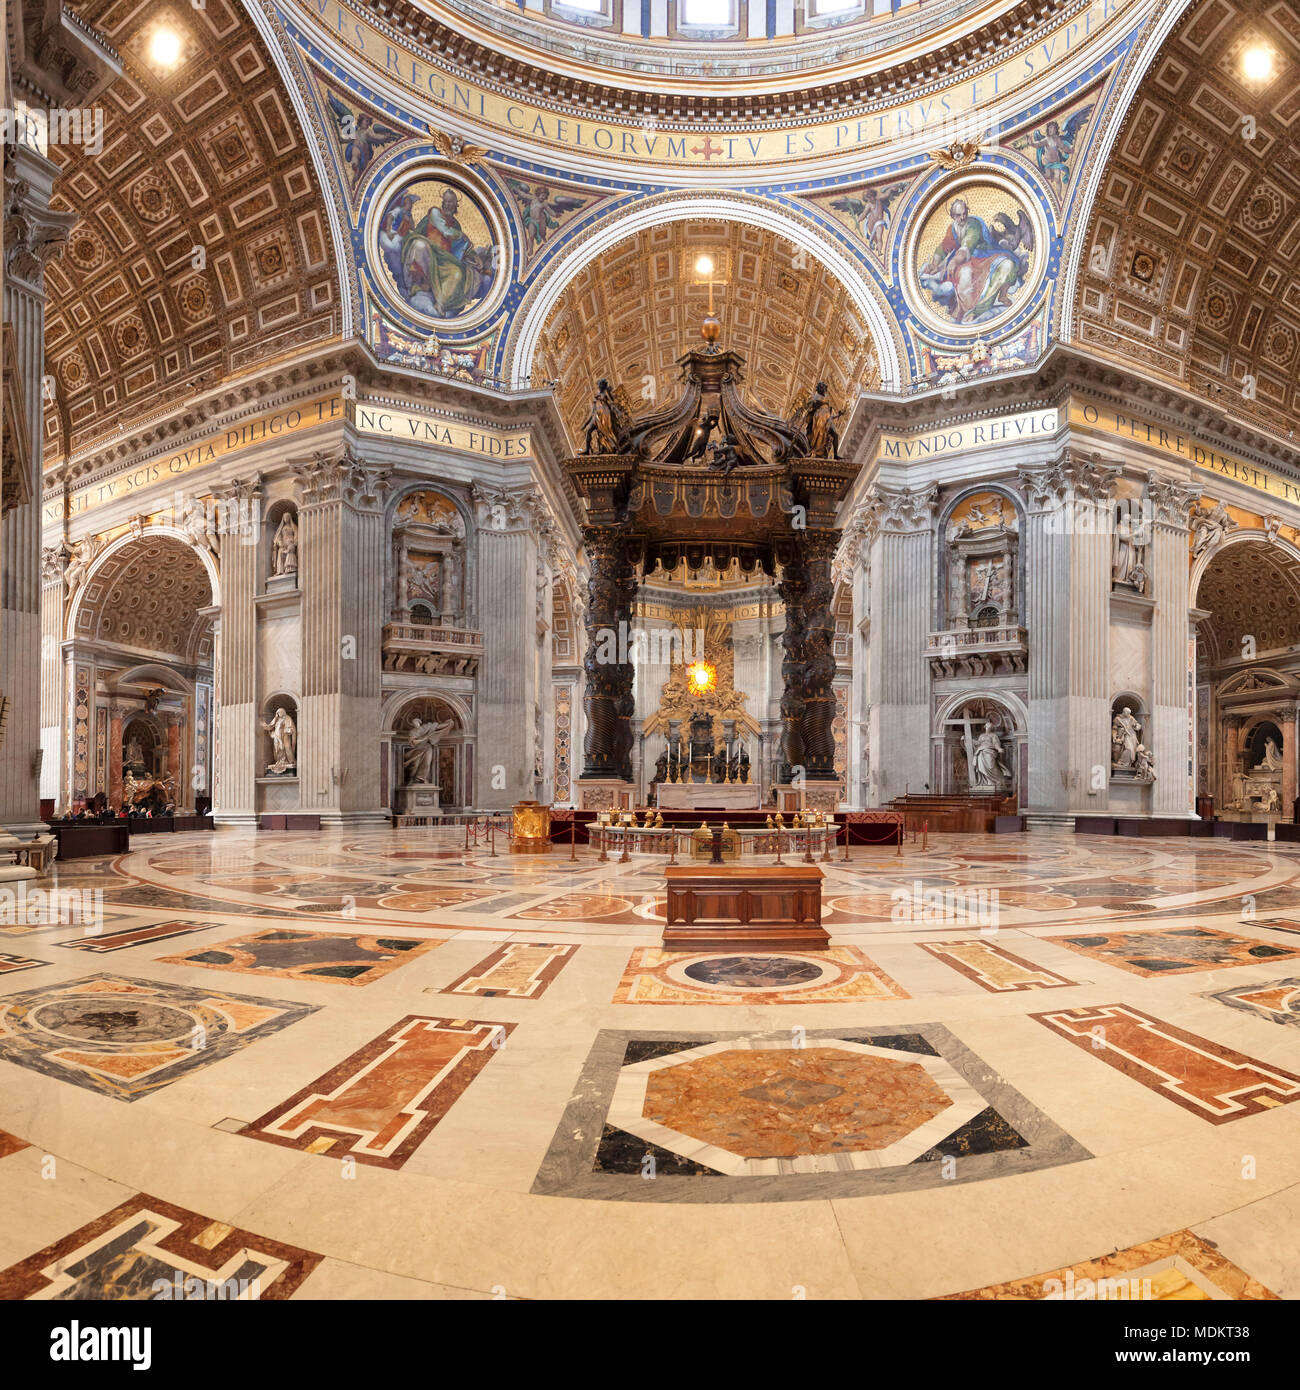 https://c8.alamy.com/compde/mdkt38/interieur-saint-peters-basilica-basilika-di-san-pietro-vatikan-rom-latium-italien-mdkt38.jpg